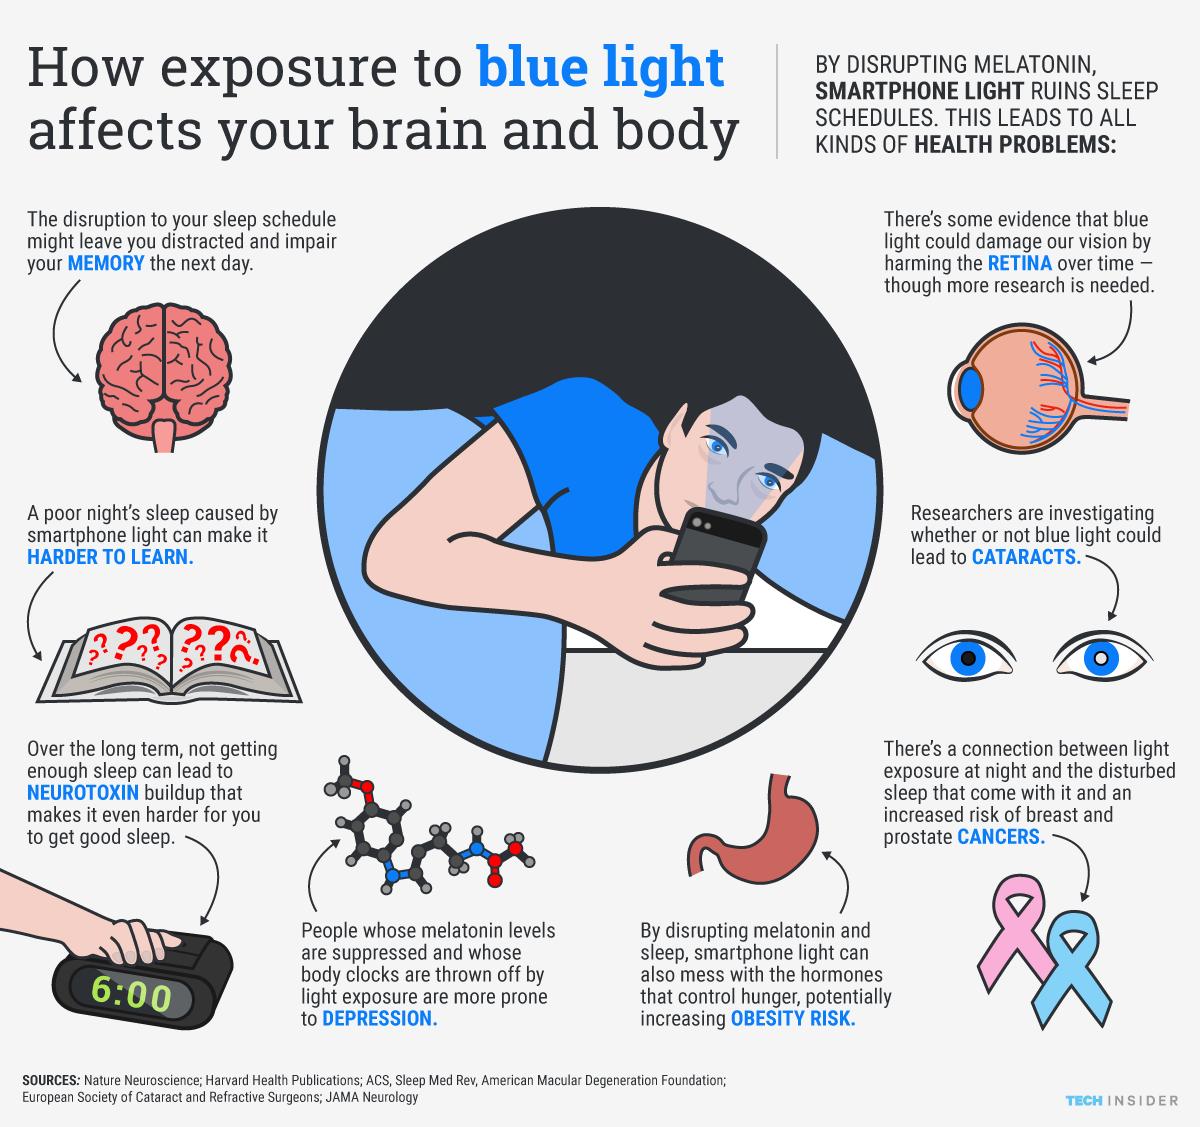 Impact of light on sleep